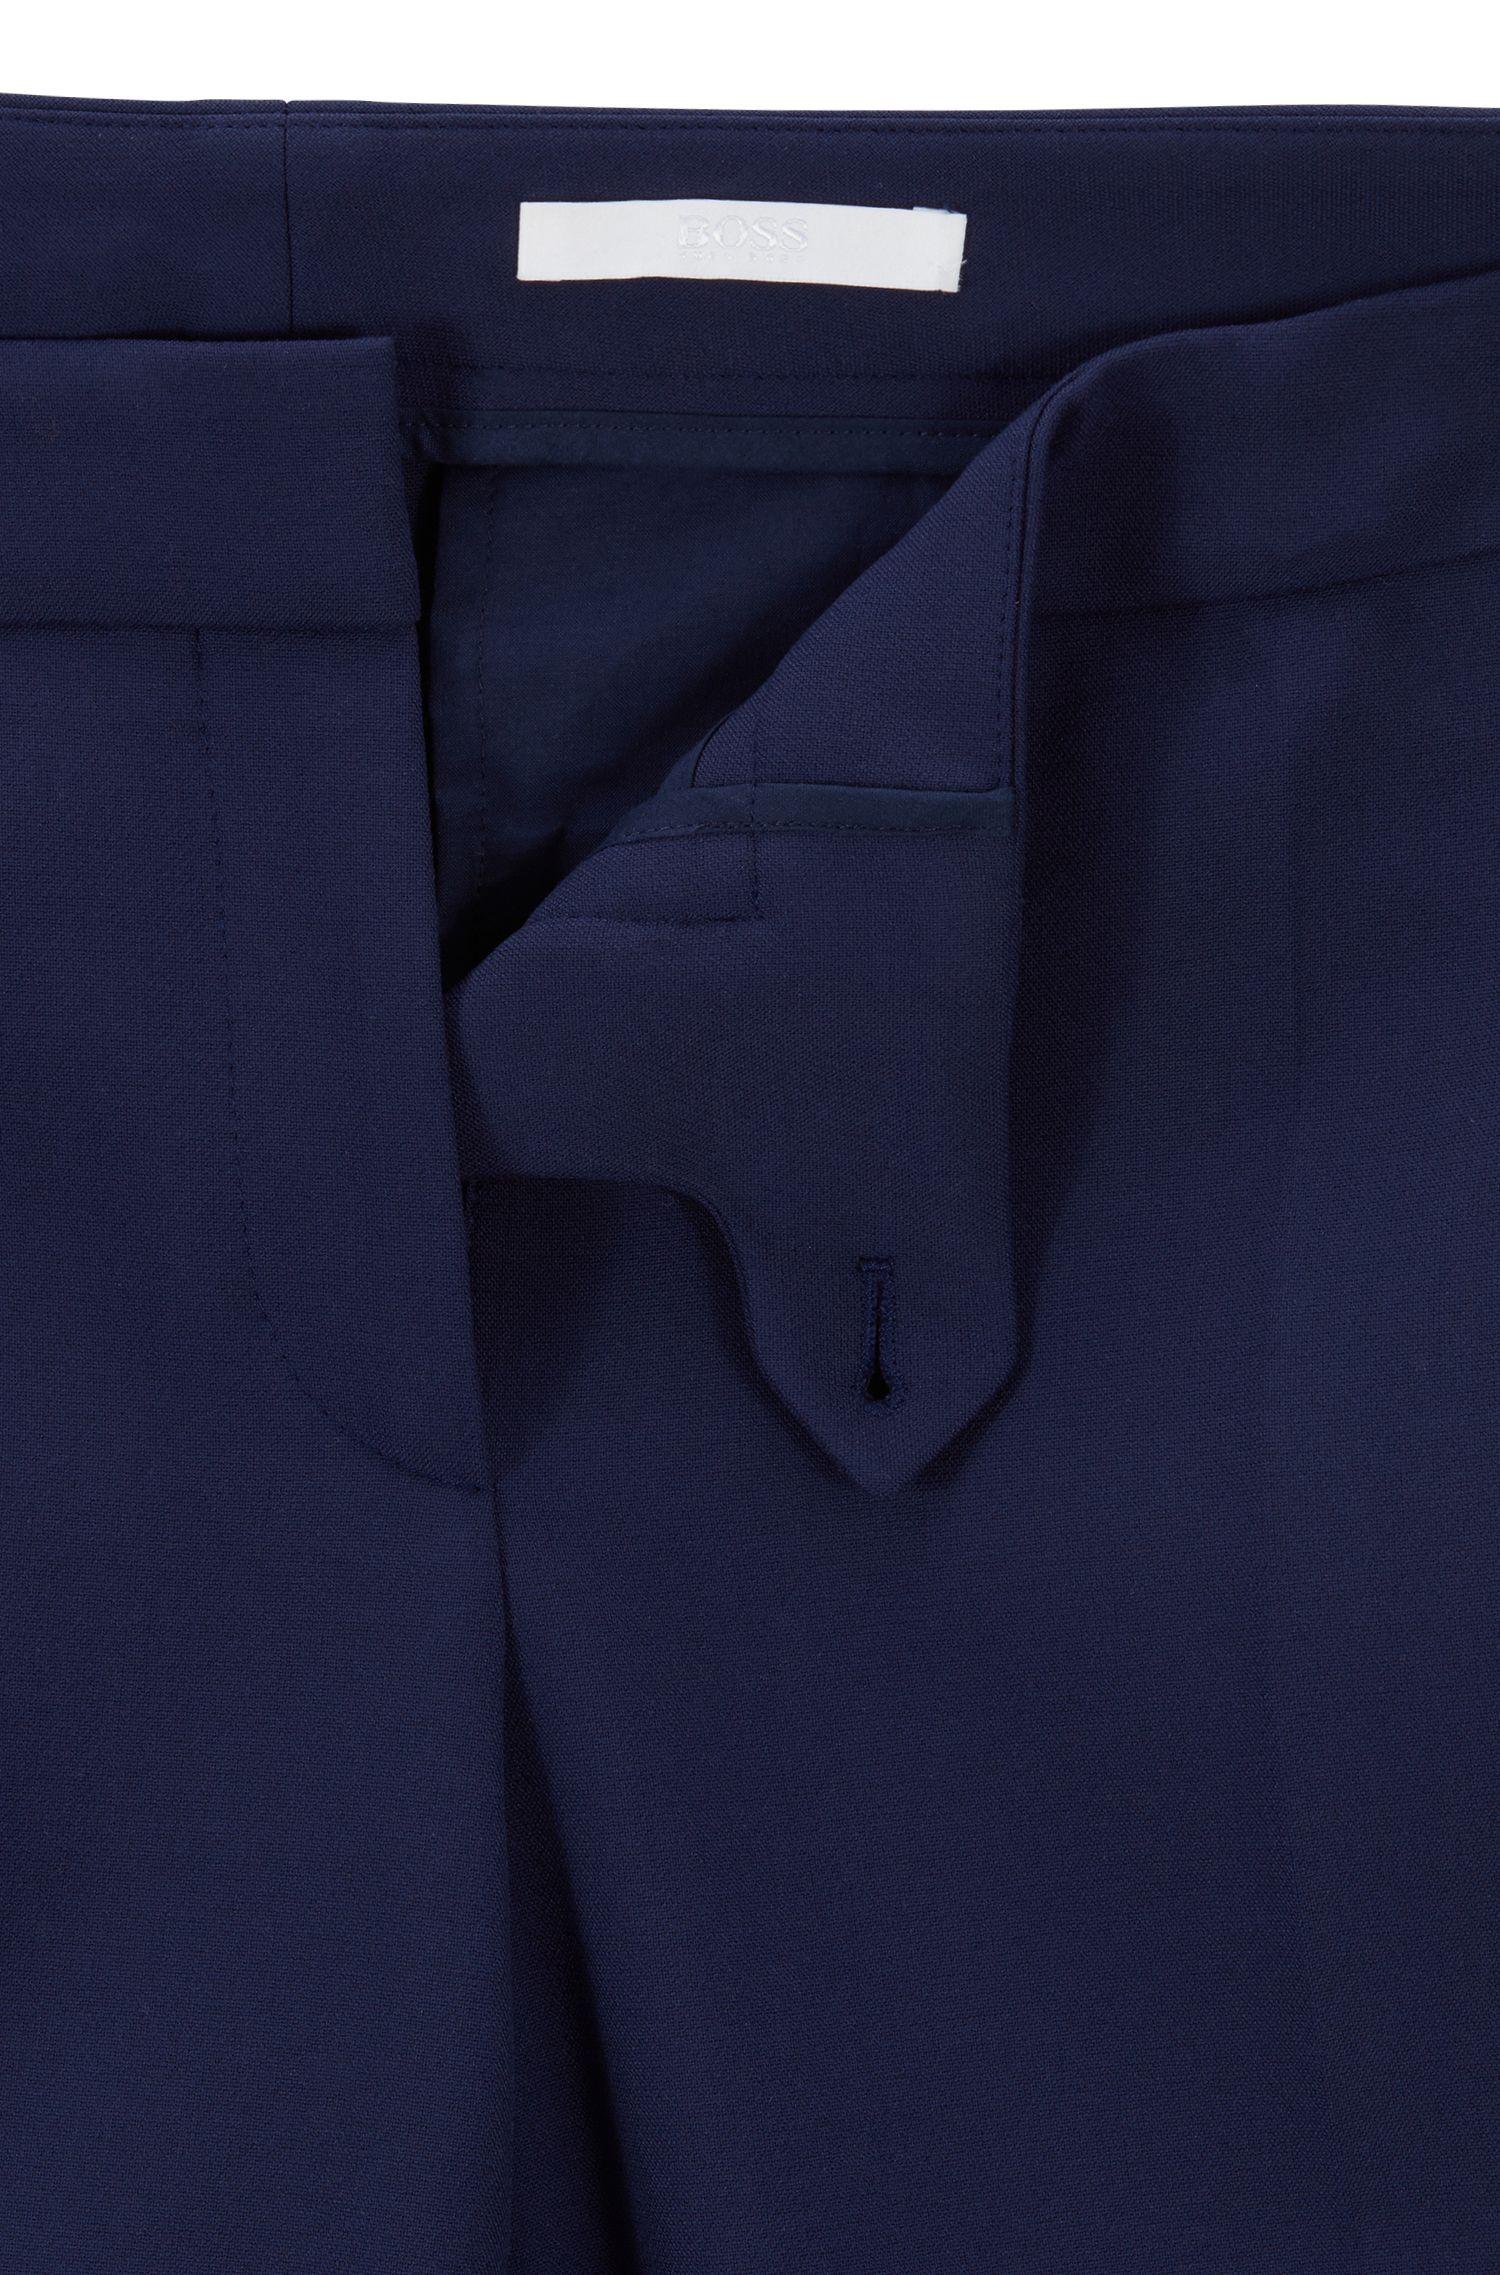 Pantalon Regular Fit en tissu stretch portugais, Bleu foncé